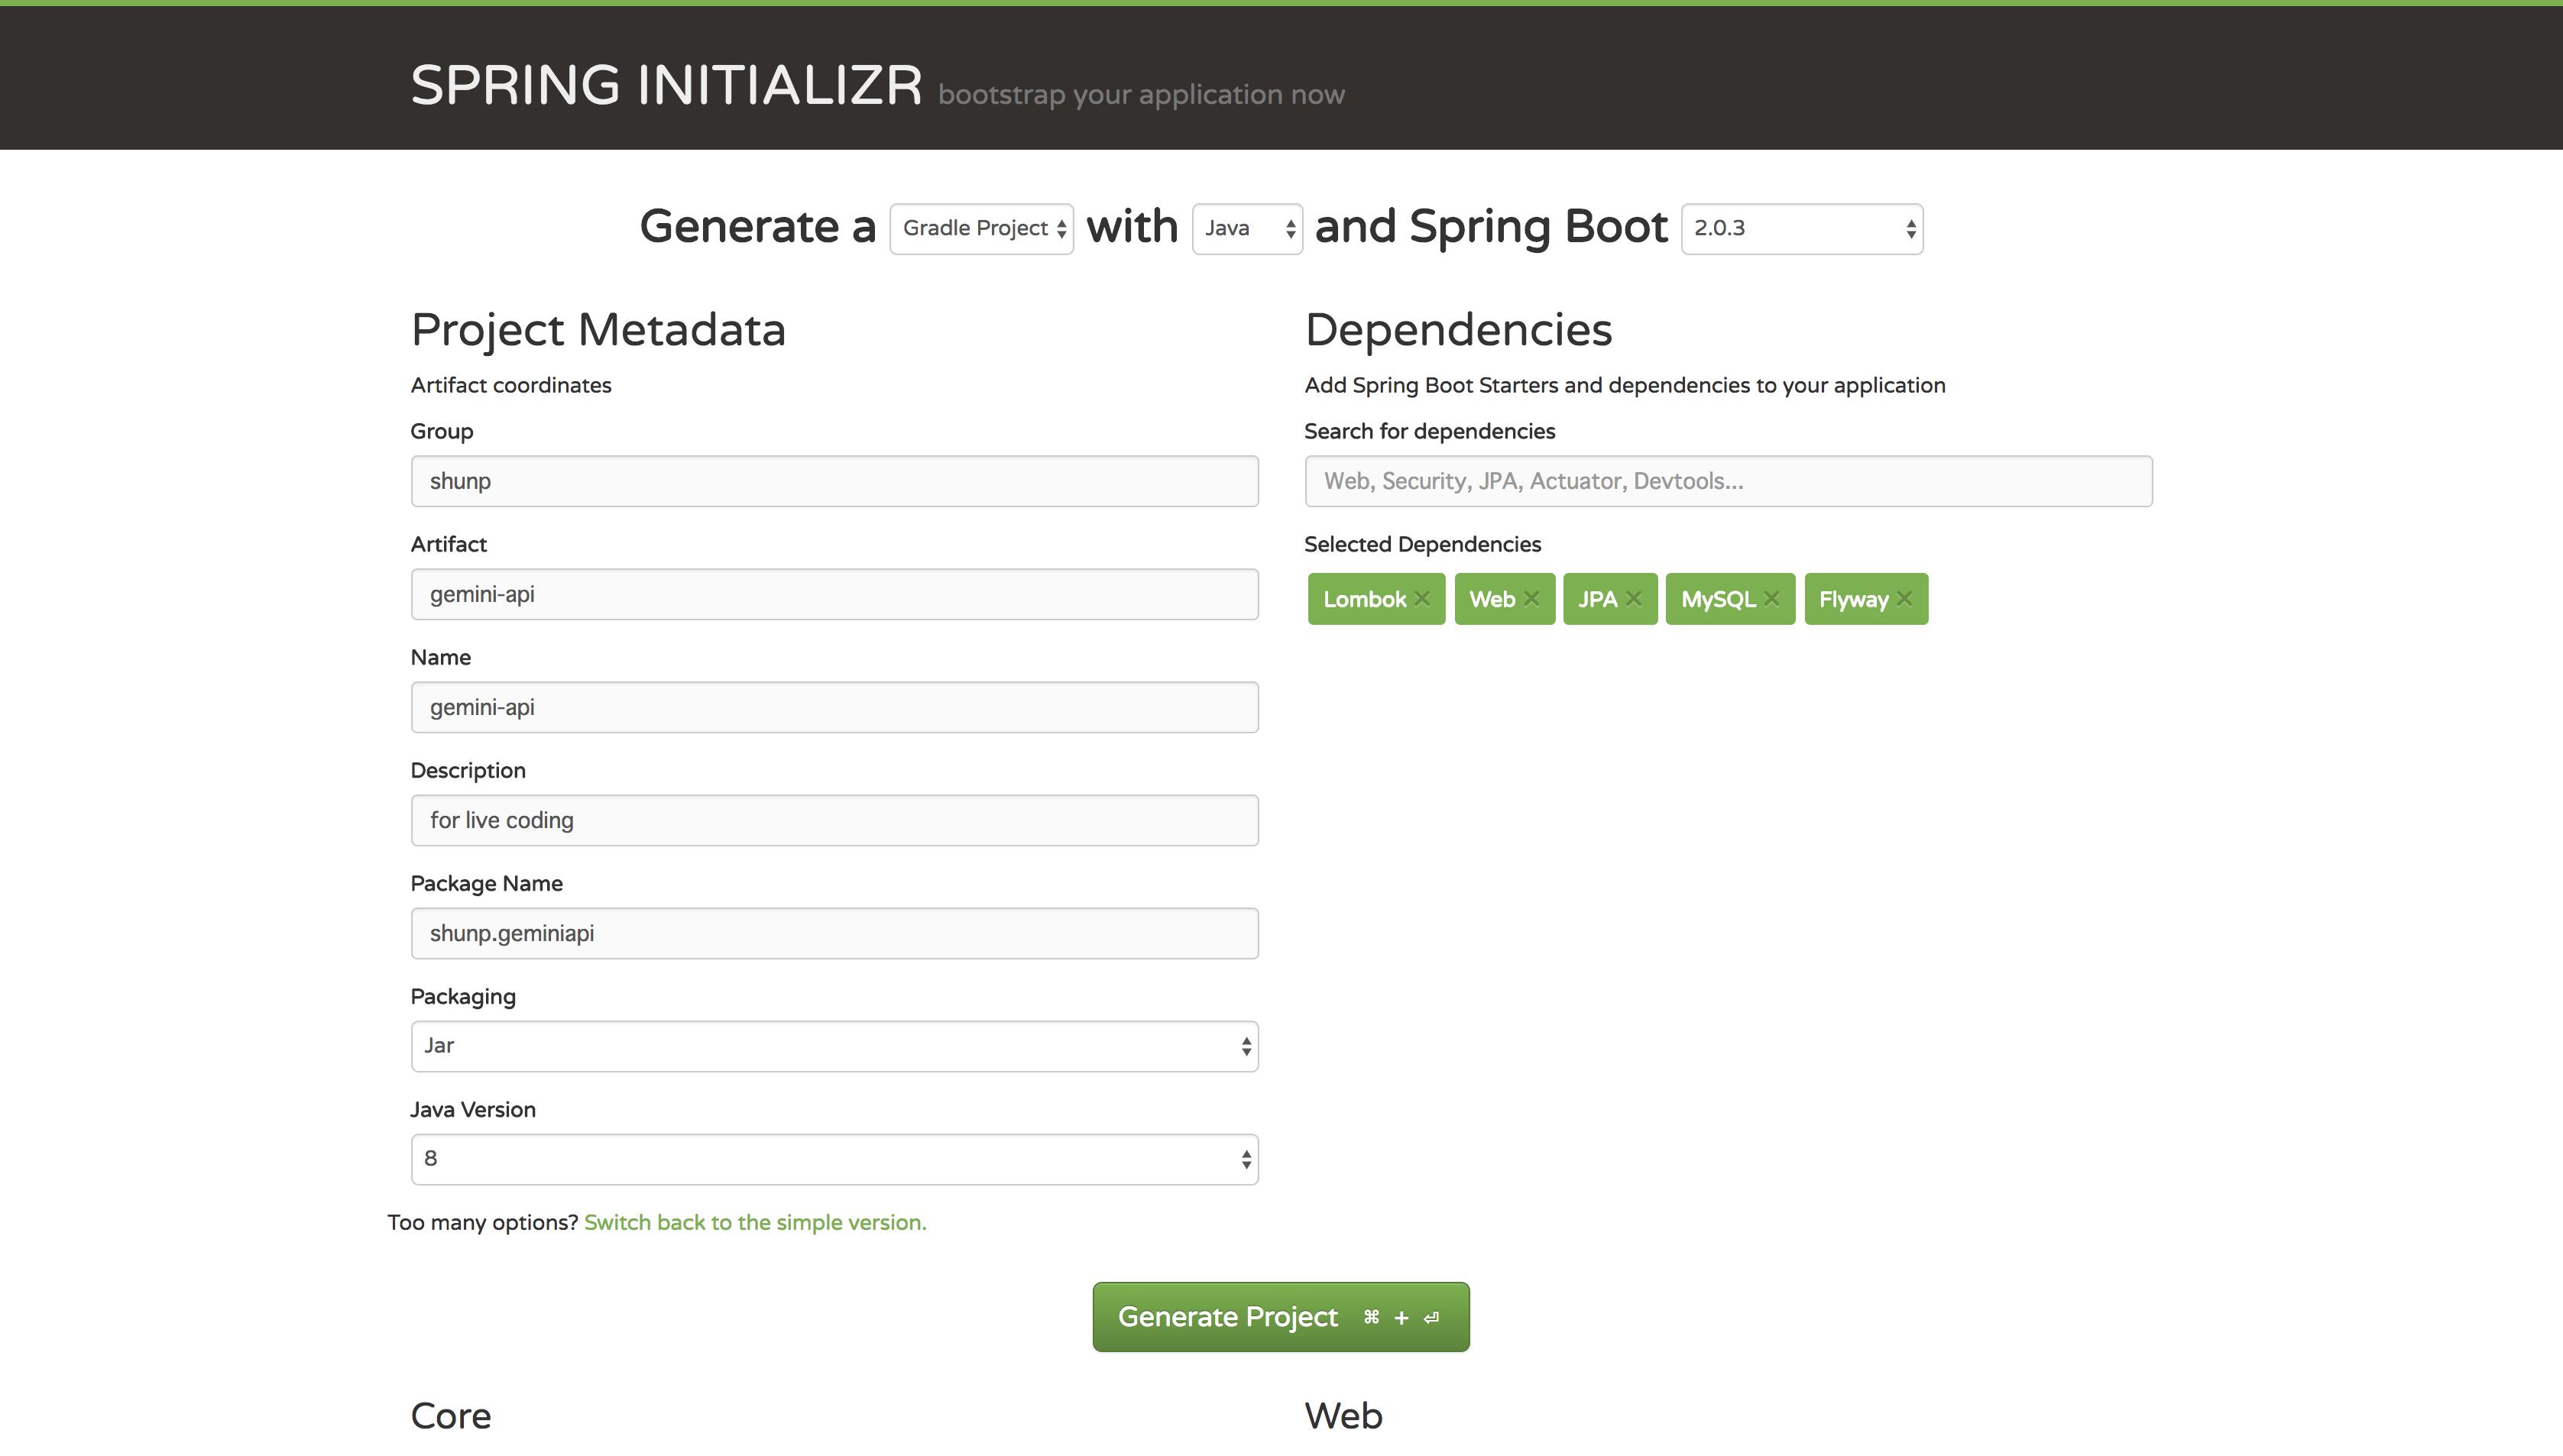 FireShot Capture 54 - Spring Initializr - https___start.spring.io_.png